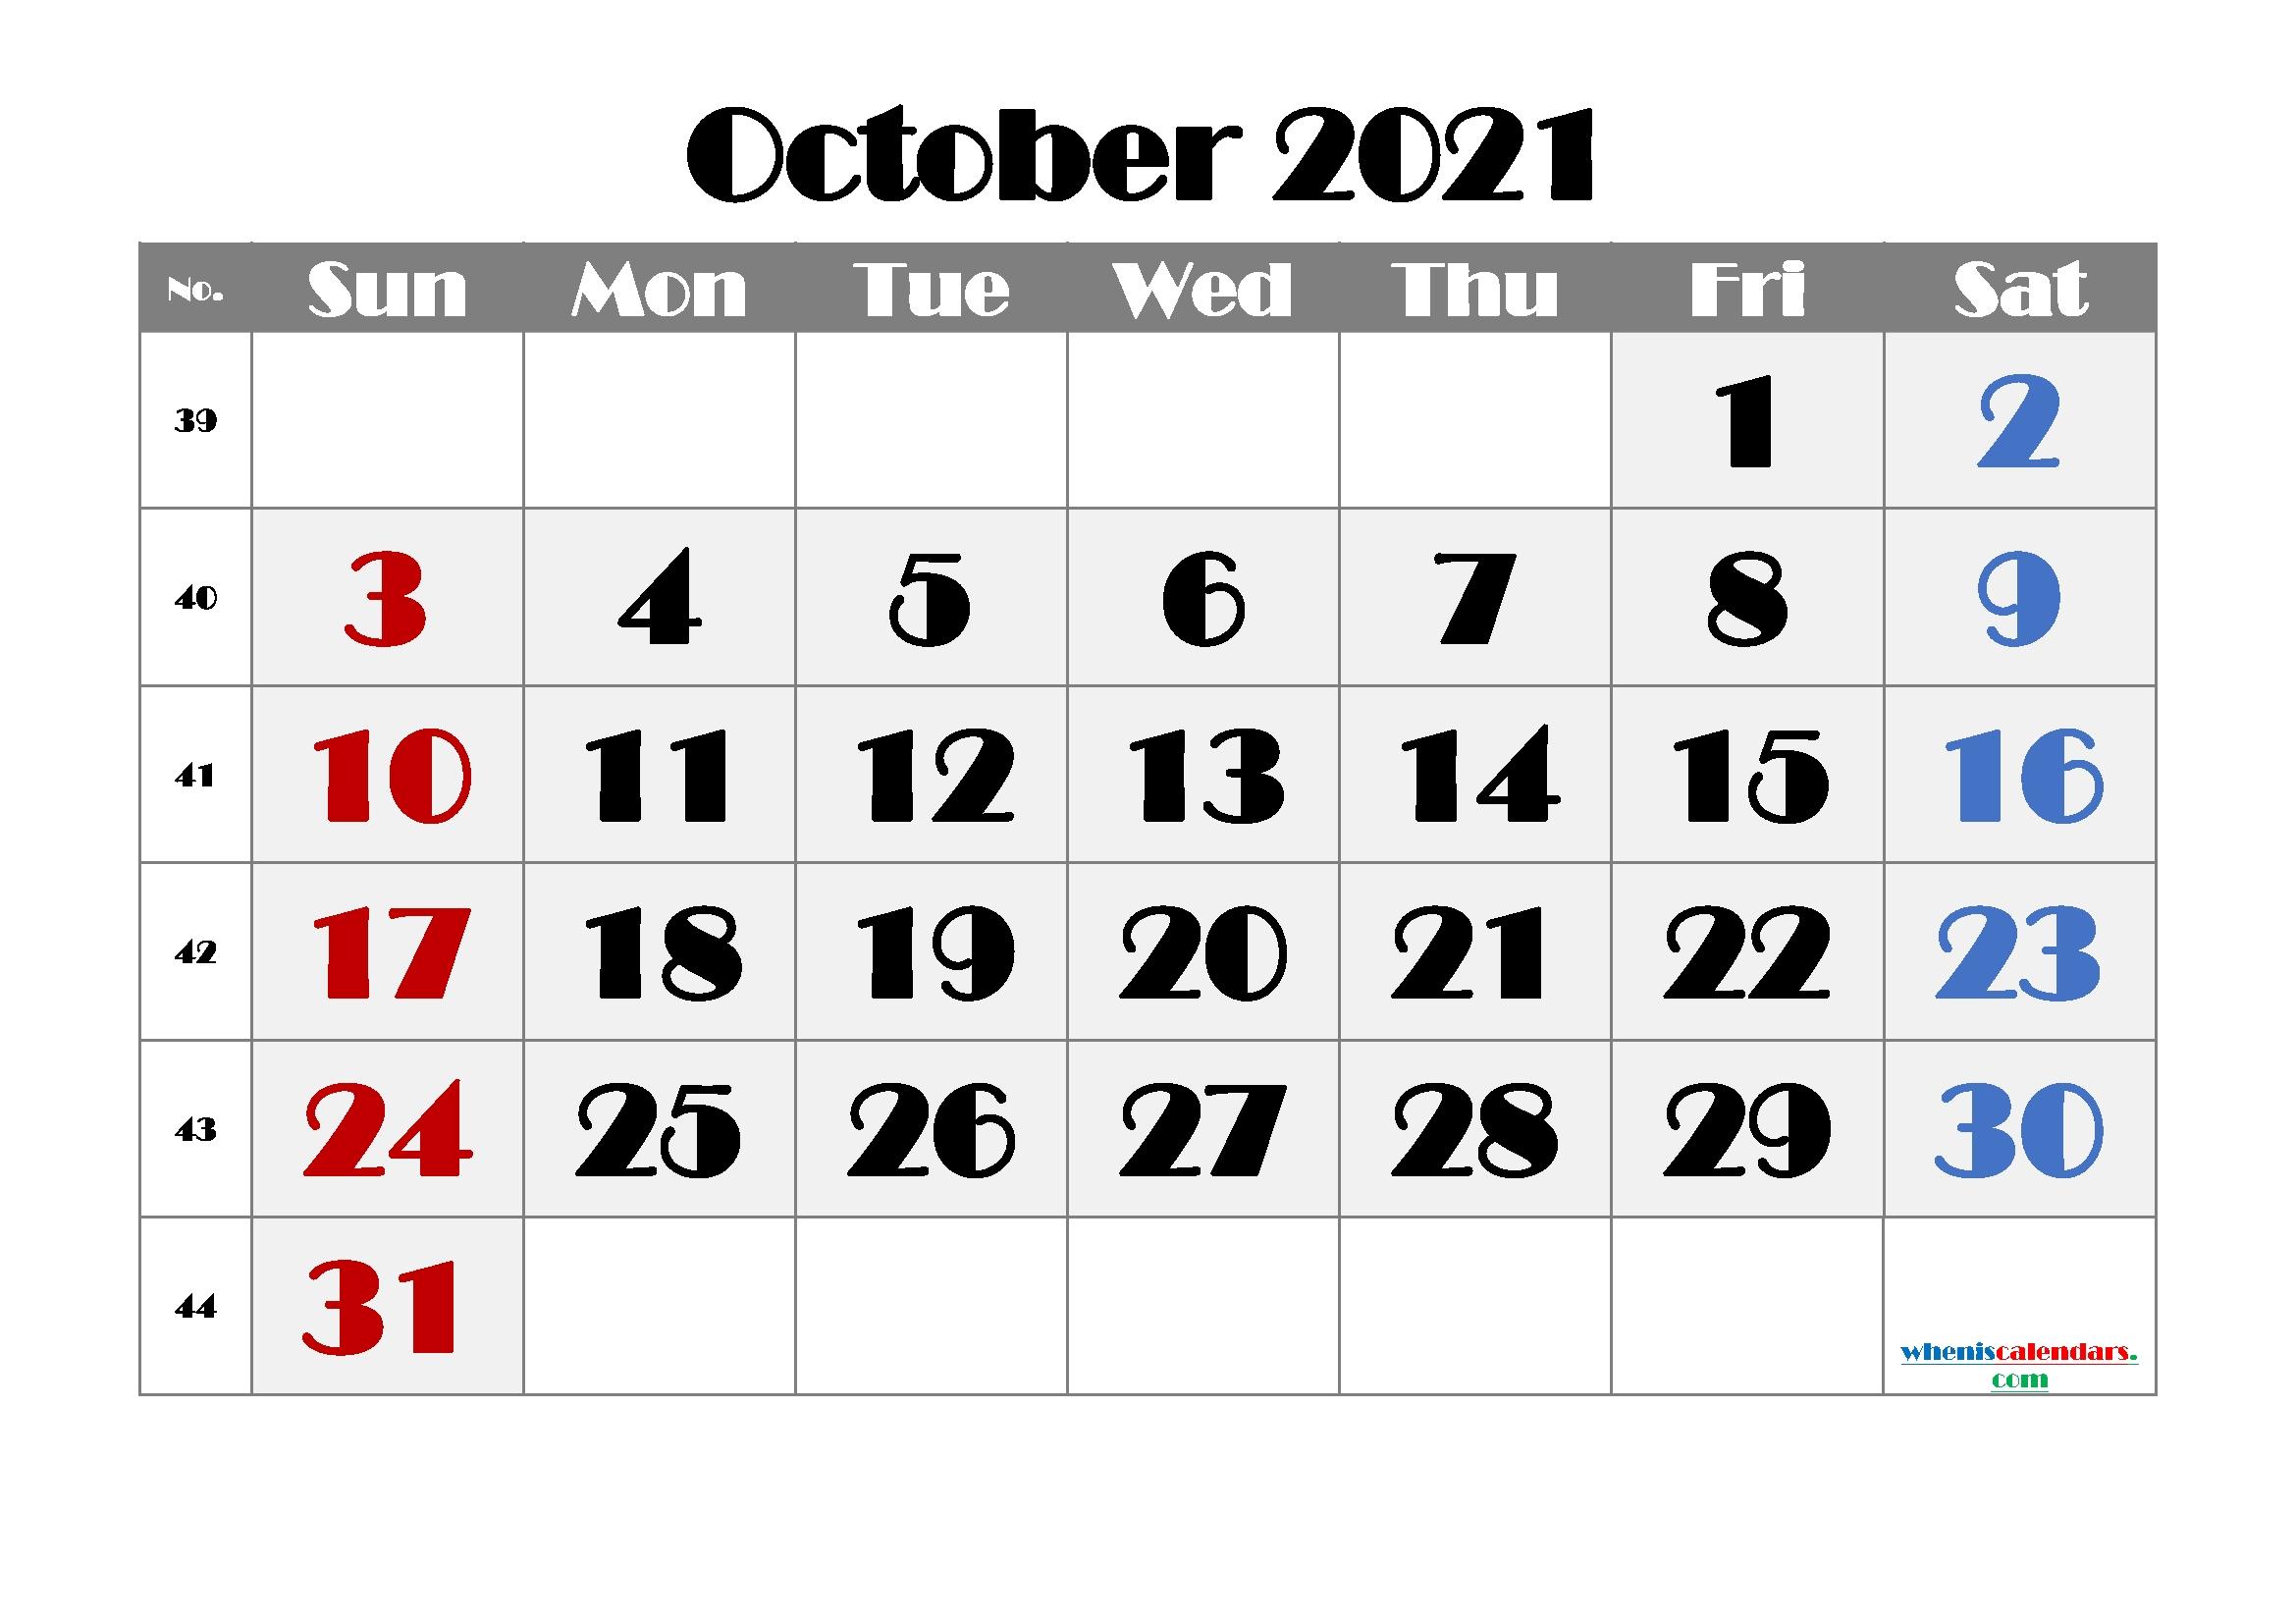 Free Printable Calendar October 2021 2022 And 2023 October 2021 Calendar Cute